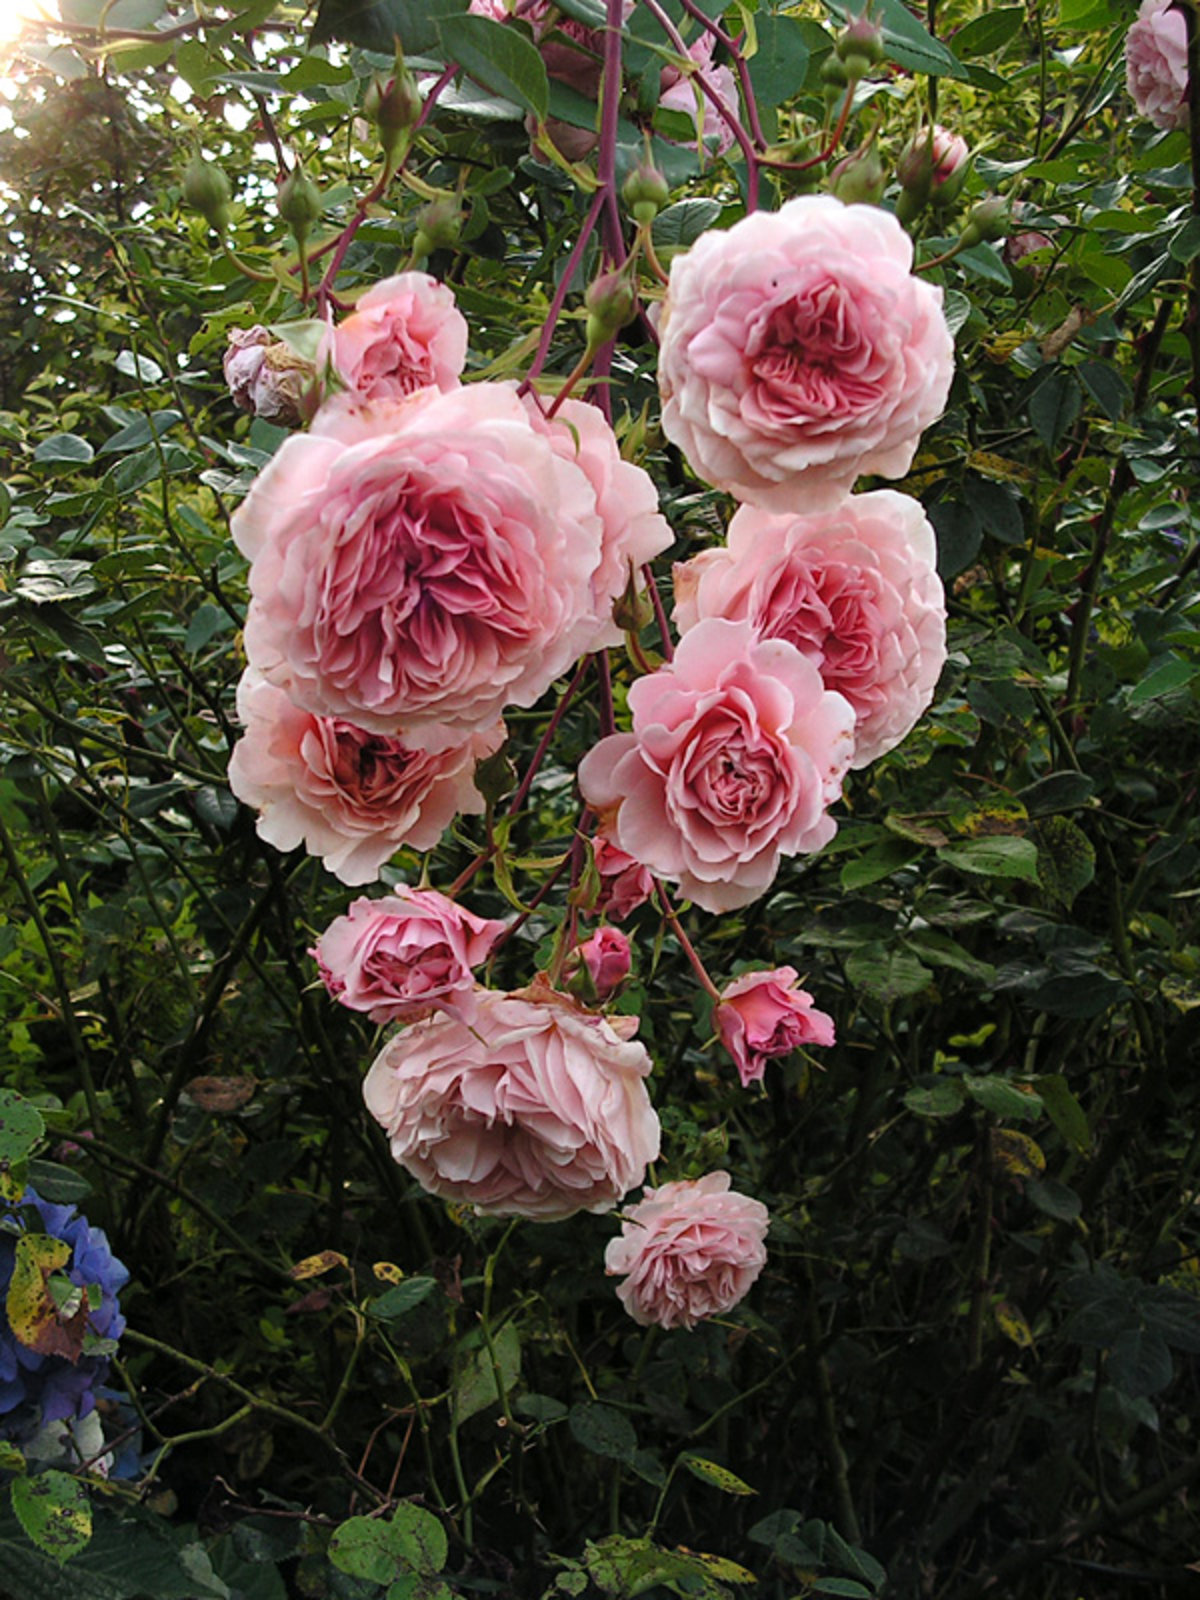 rose 39 william morris 39 rosen bei schmid gartenpflanzen online kaufen. Black Bedroom Furniture Sets. Home Design Ideas